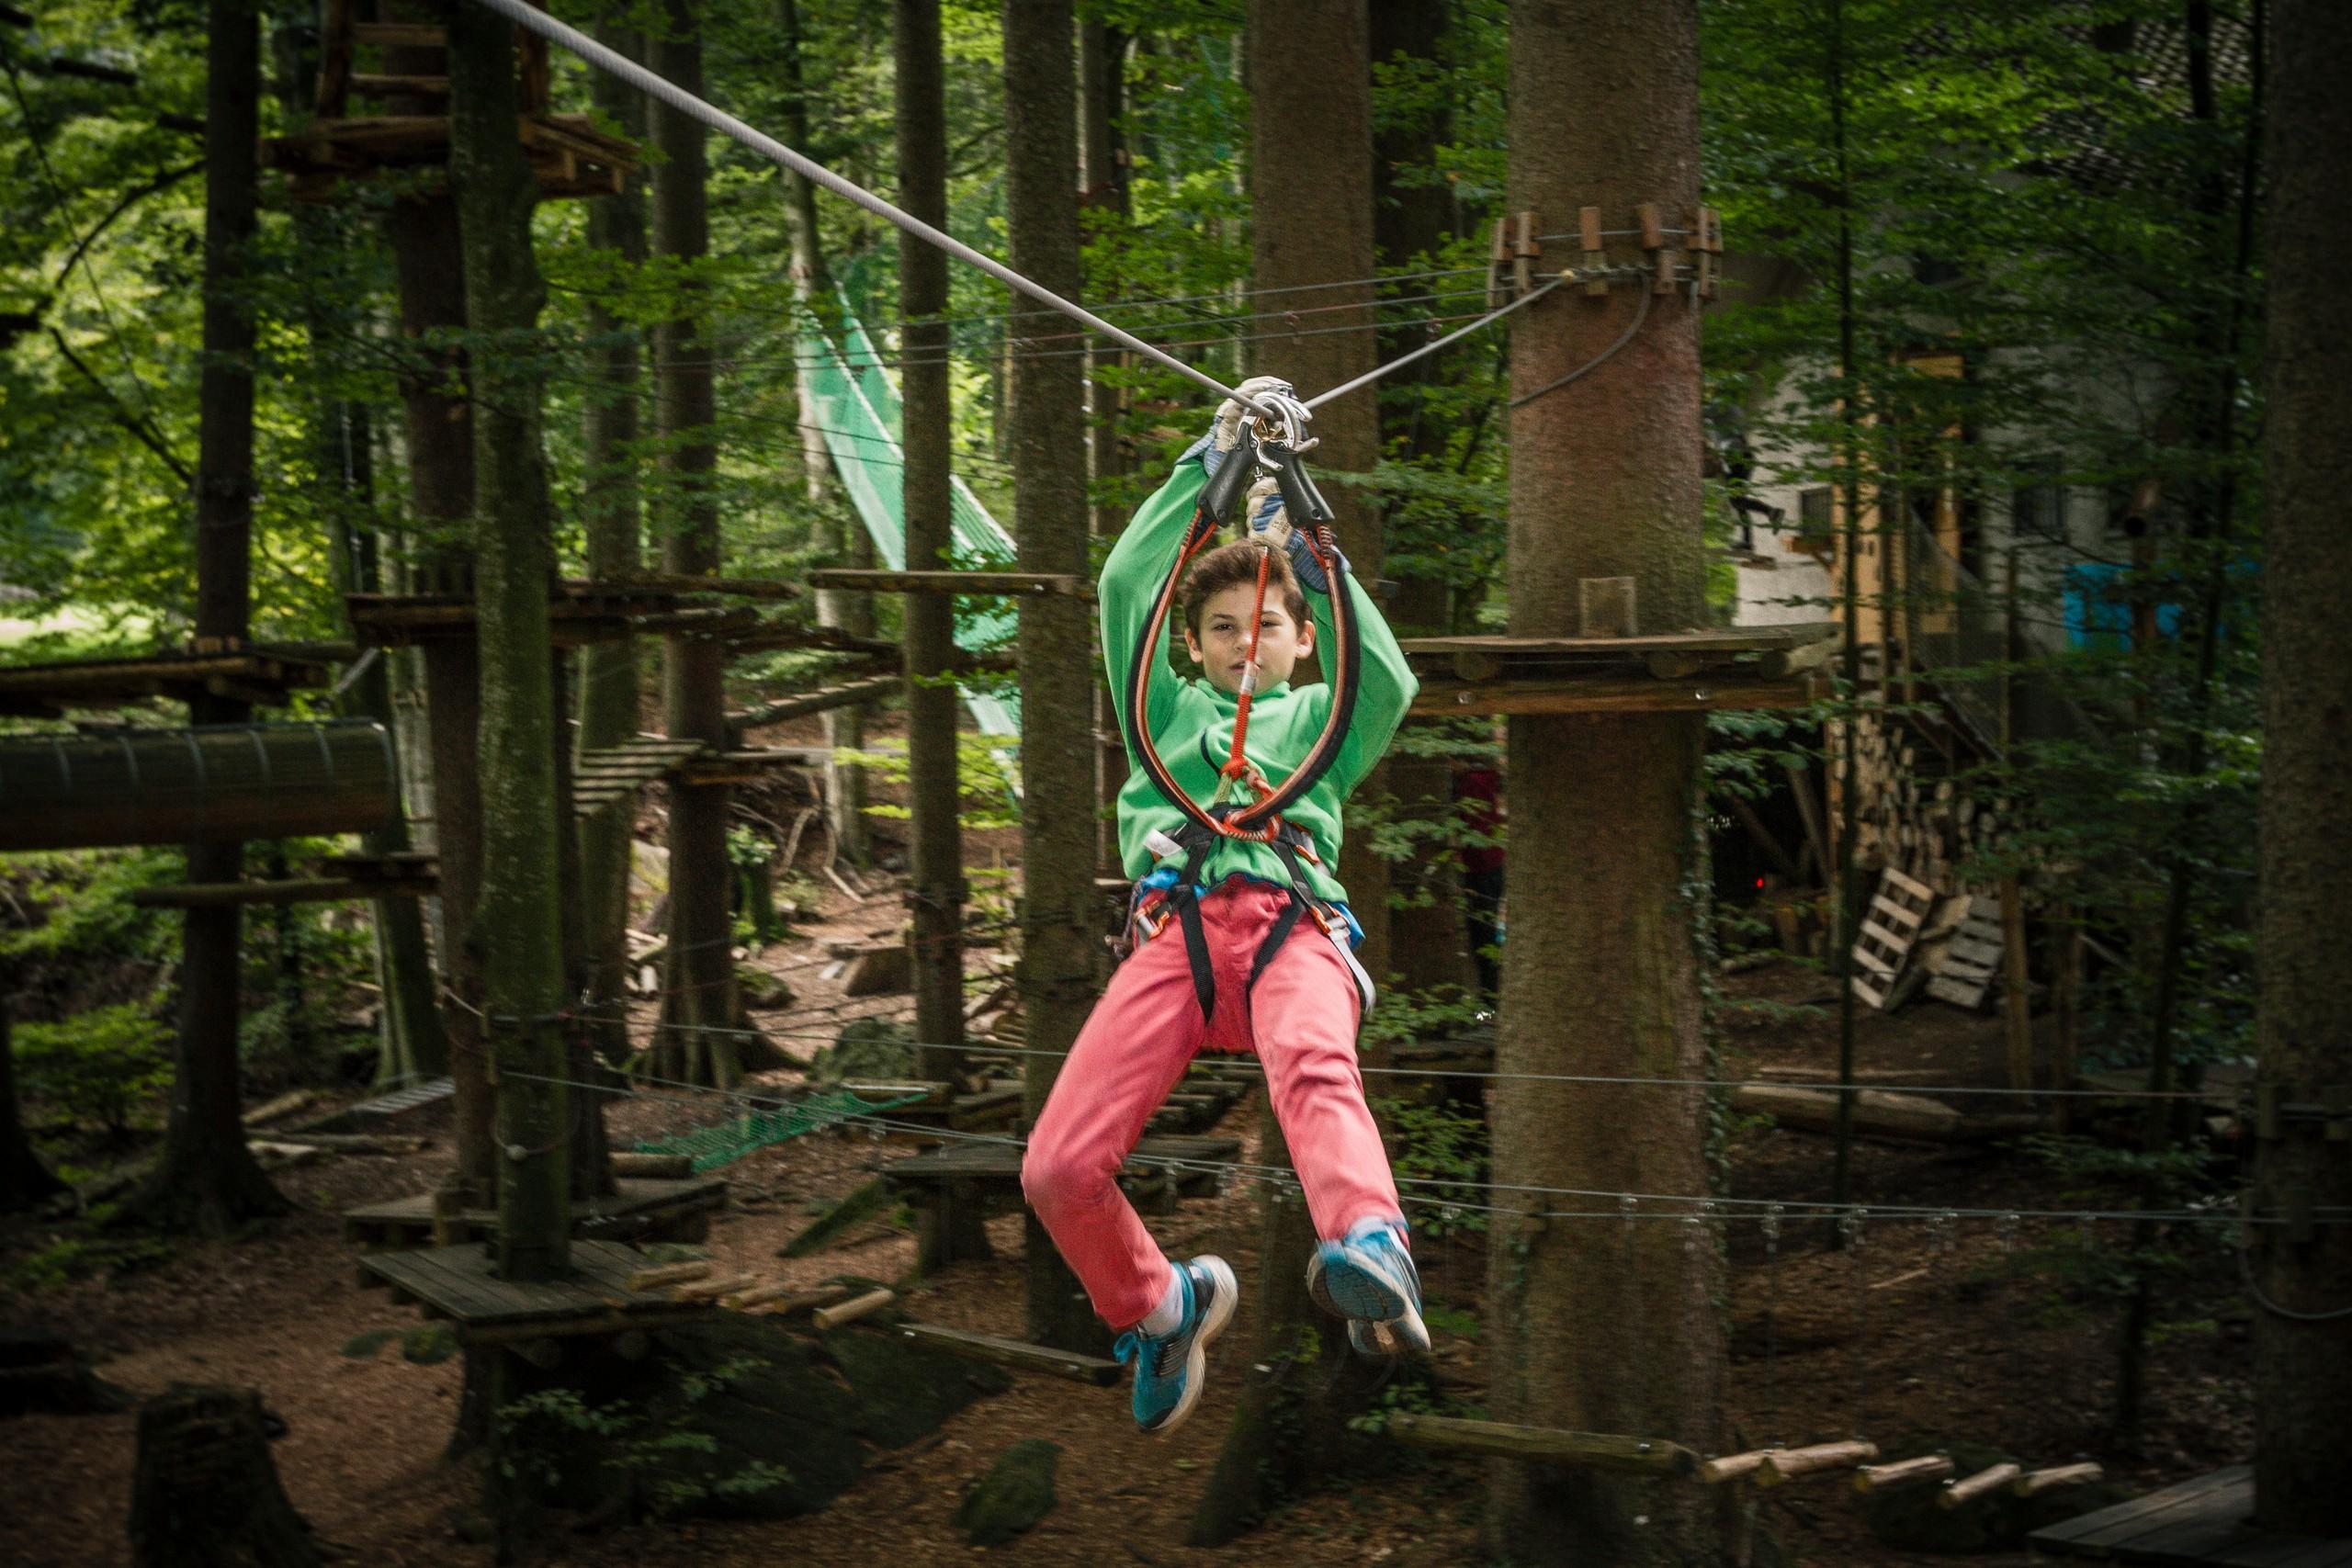 interlaken-seilpark-junge-sommer-zipline-wald-familienaktivitaeten